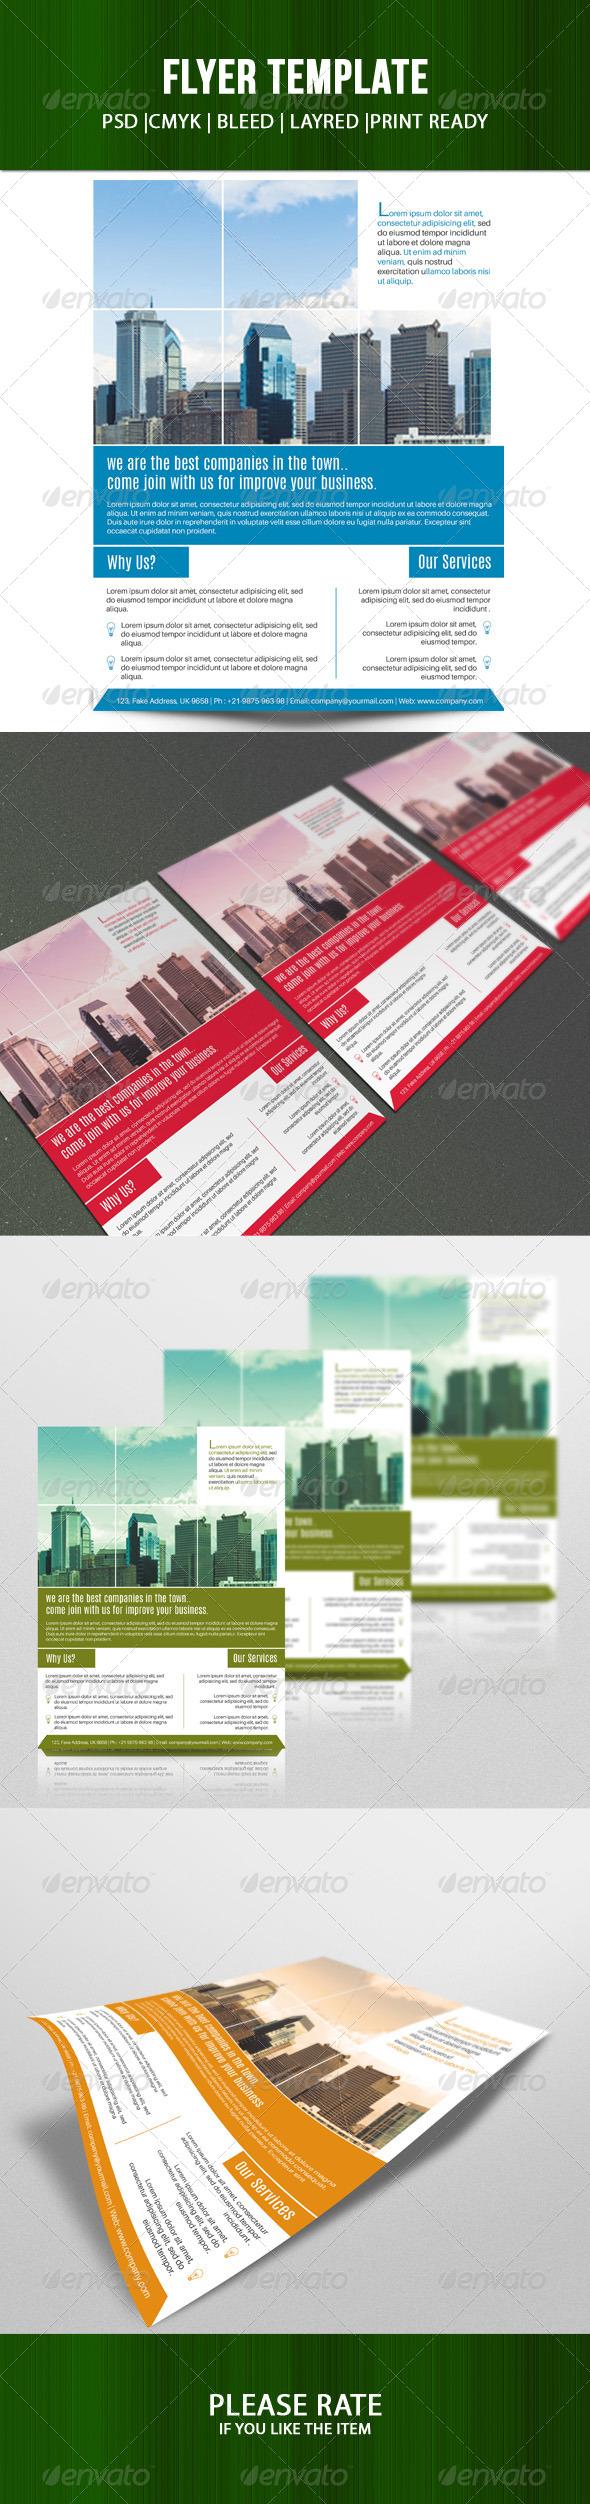 GraphicRiver Business Flyer tempalte-V36 7819509